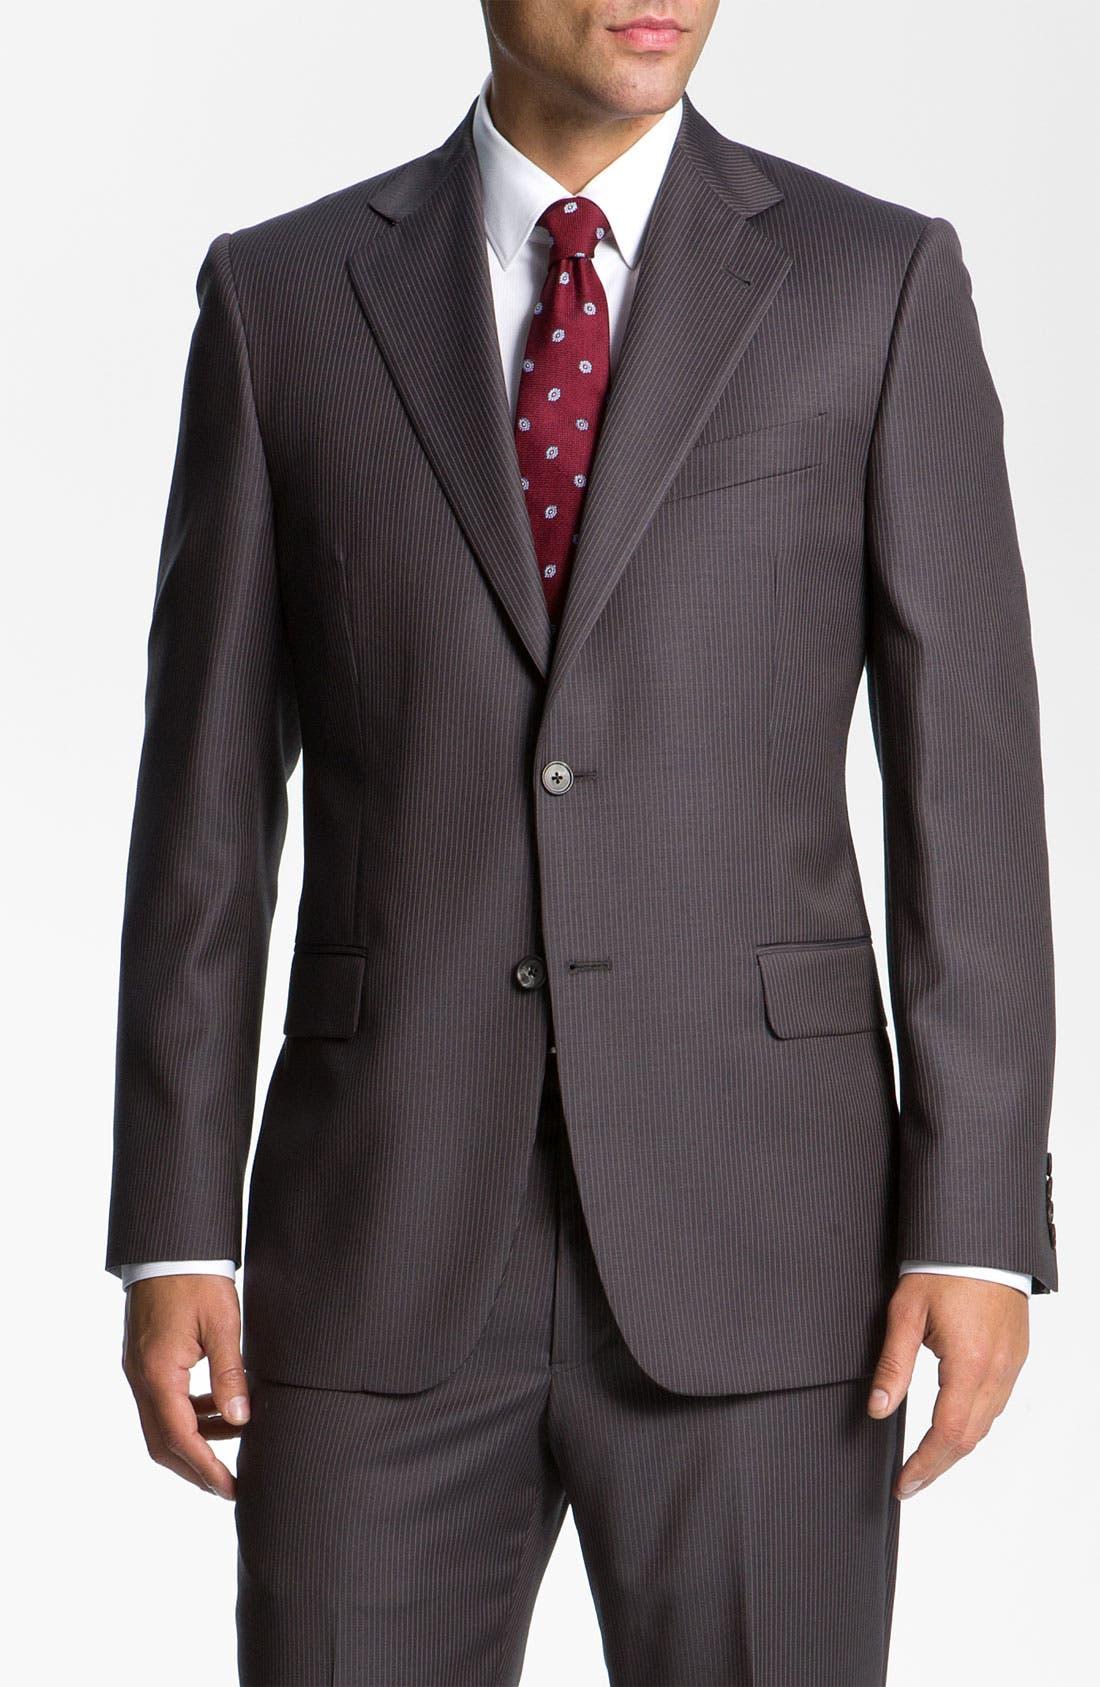 Alternate Image 1 Selected - Joseph Abboud Pinstripe Suit